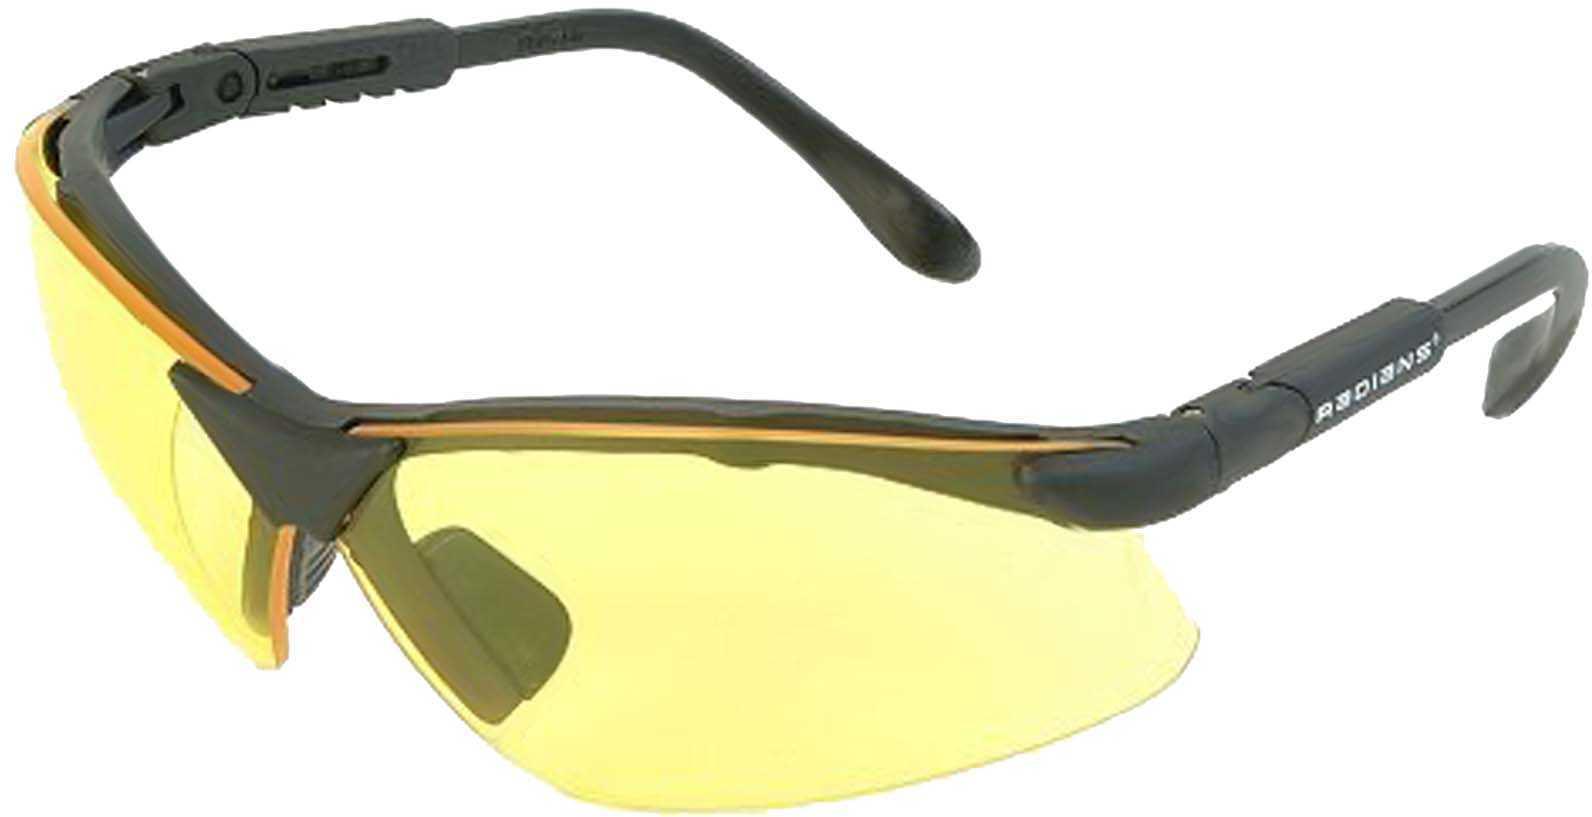 Revelation Shooting Glasses Amber Yellow Lenses Lens Angle & Temple Length adjustments - Wraparound Coverage & Side-shie